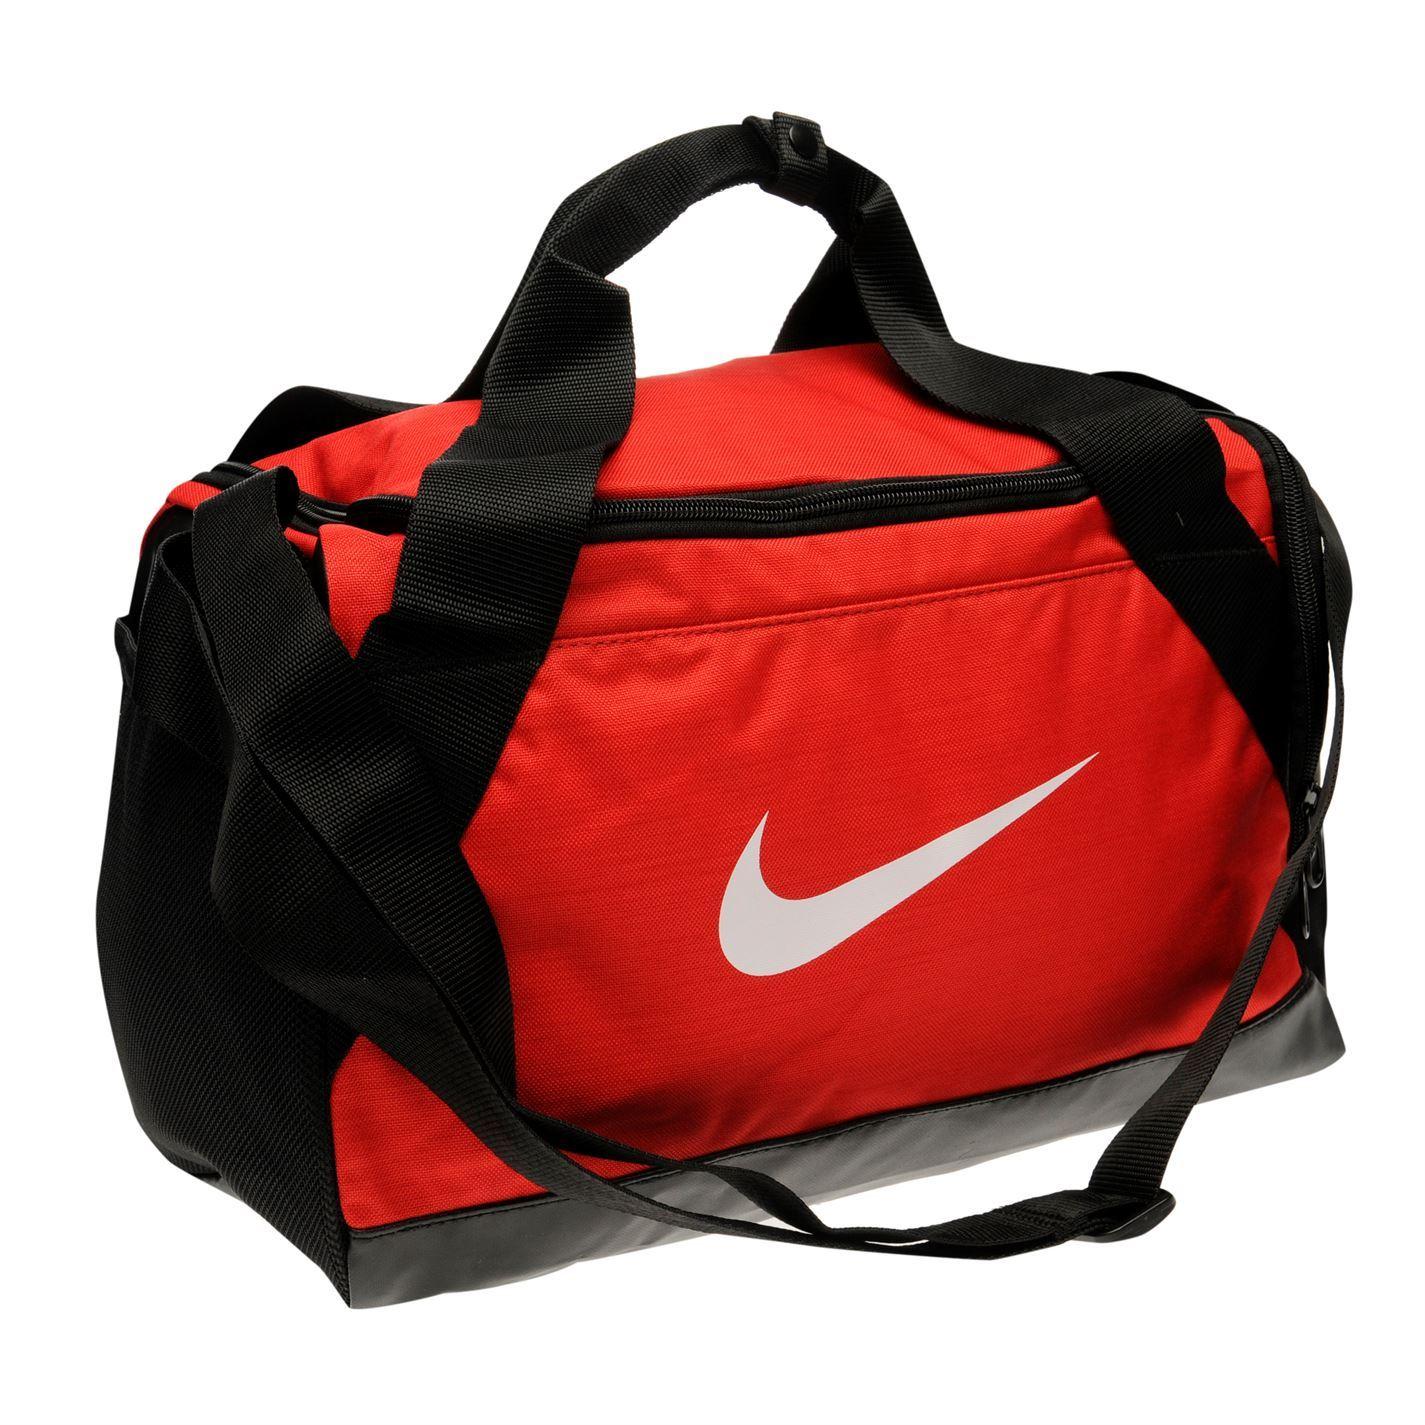 d34f02e2e33 Nike Brasilia XS Grip Sports Holdall Red Gym Kit Bag Carryall   eBay